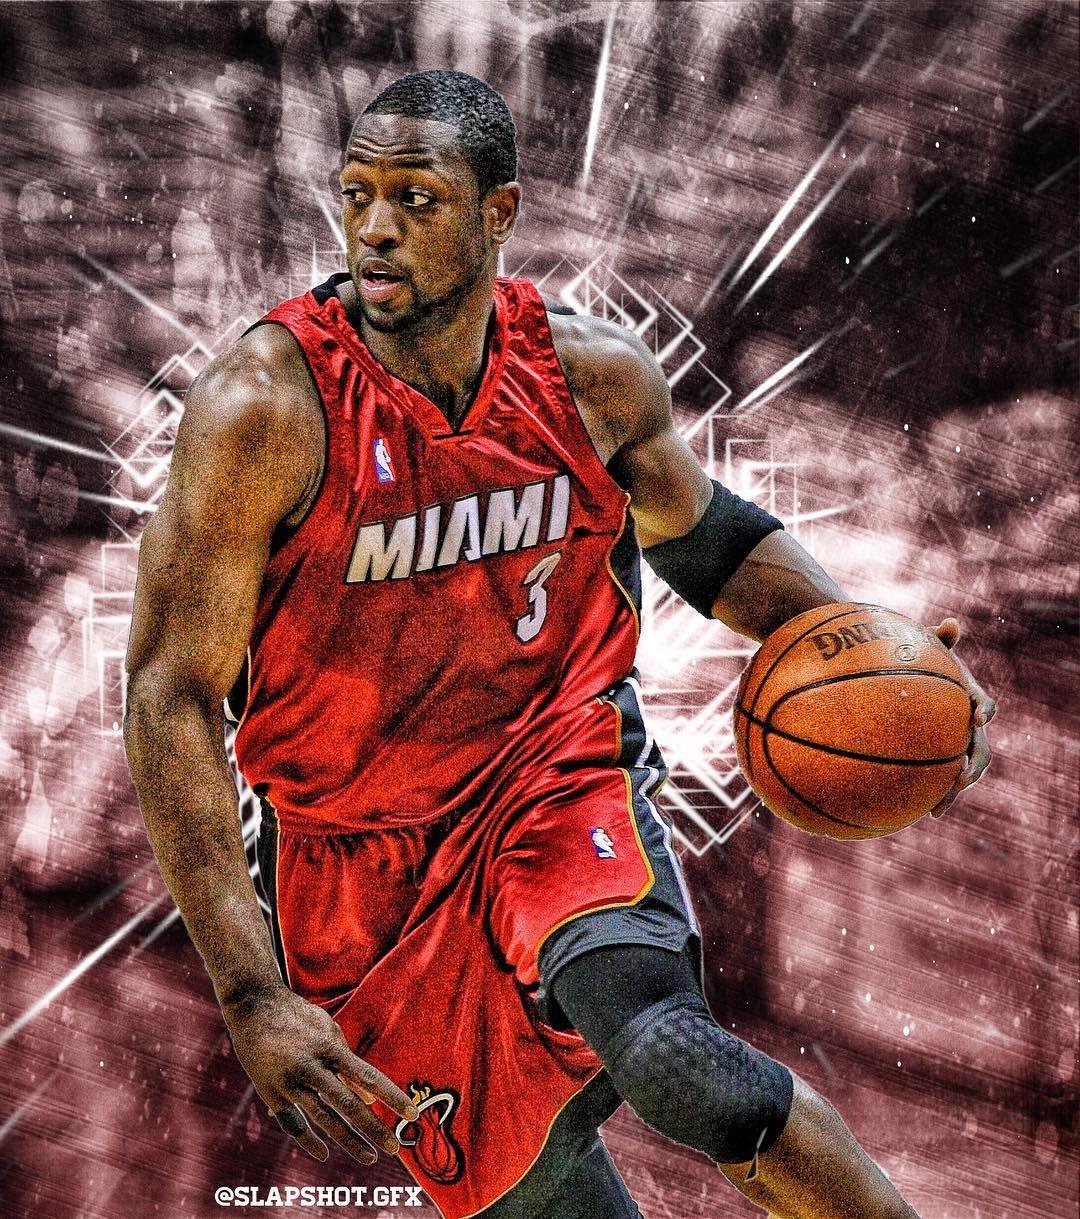 Dwyane Wade Edit Dwyanewade Nhl Nba Sports Nfl Edits Instagram Sportsedits Slapshot Mlb Football Basket Squeeze Pouch New York Yankees Baseballs